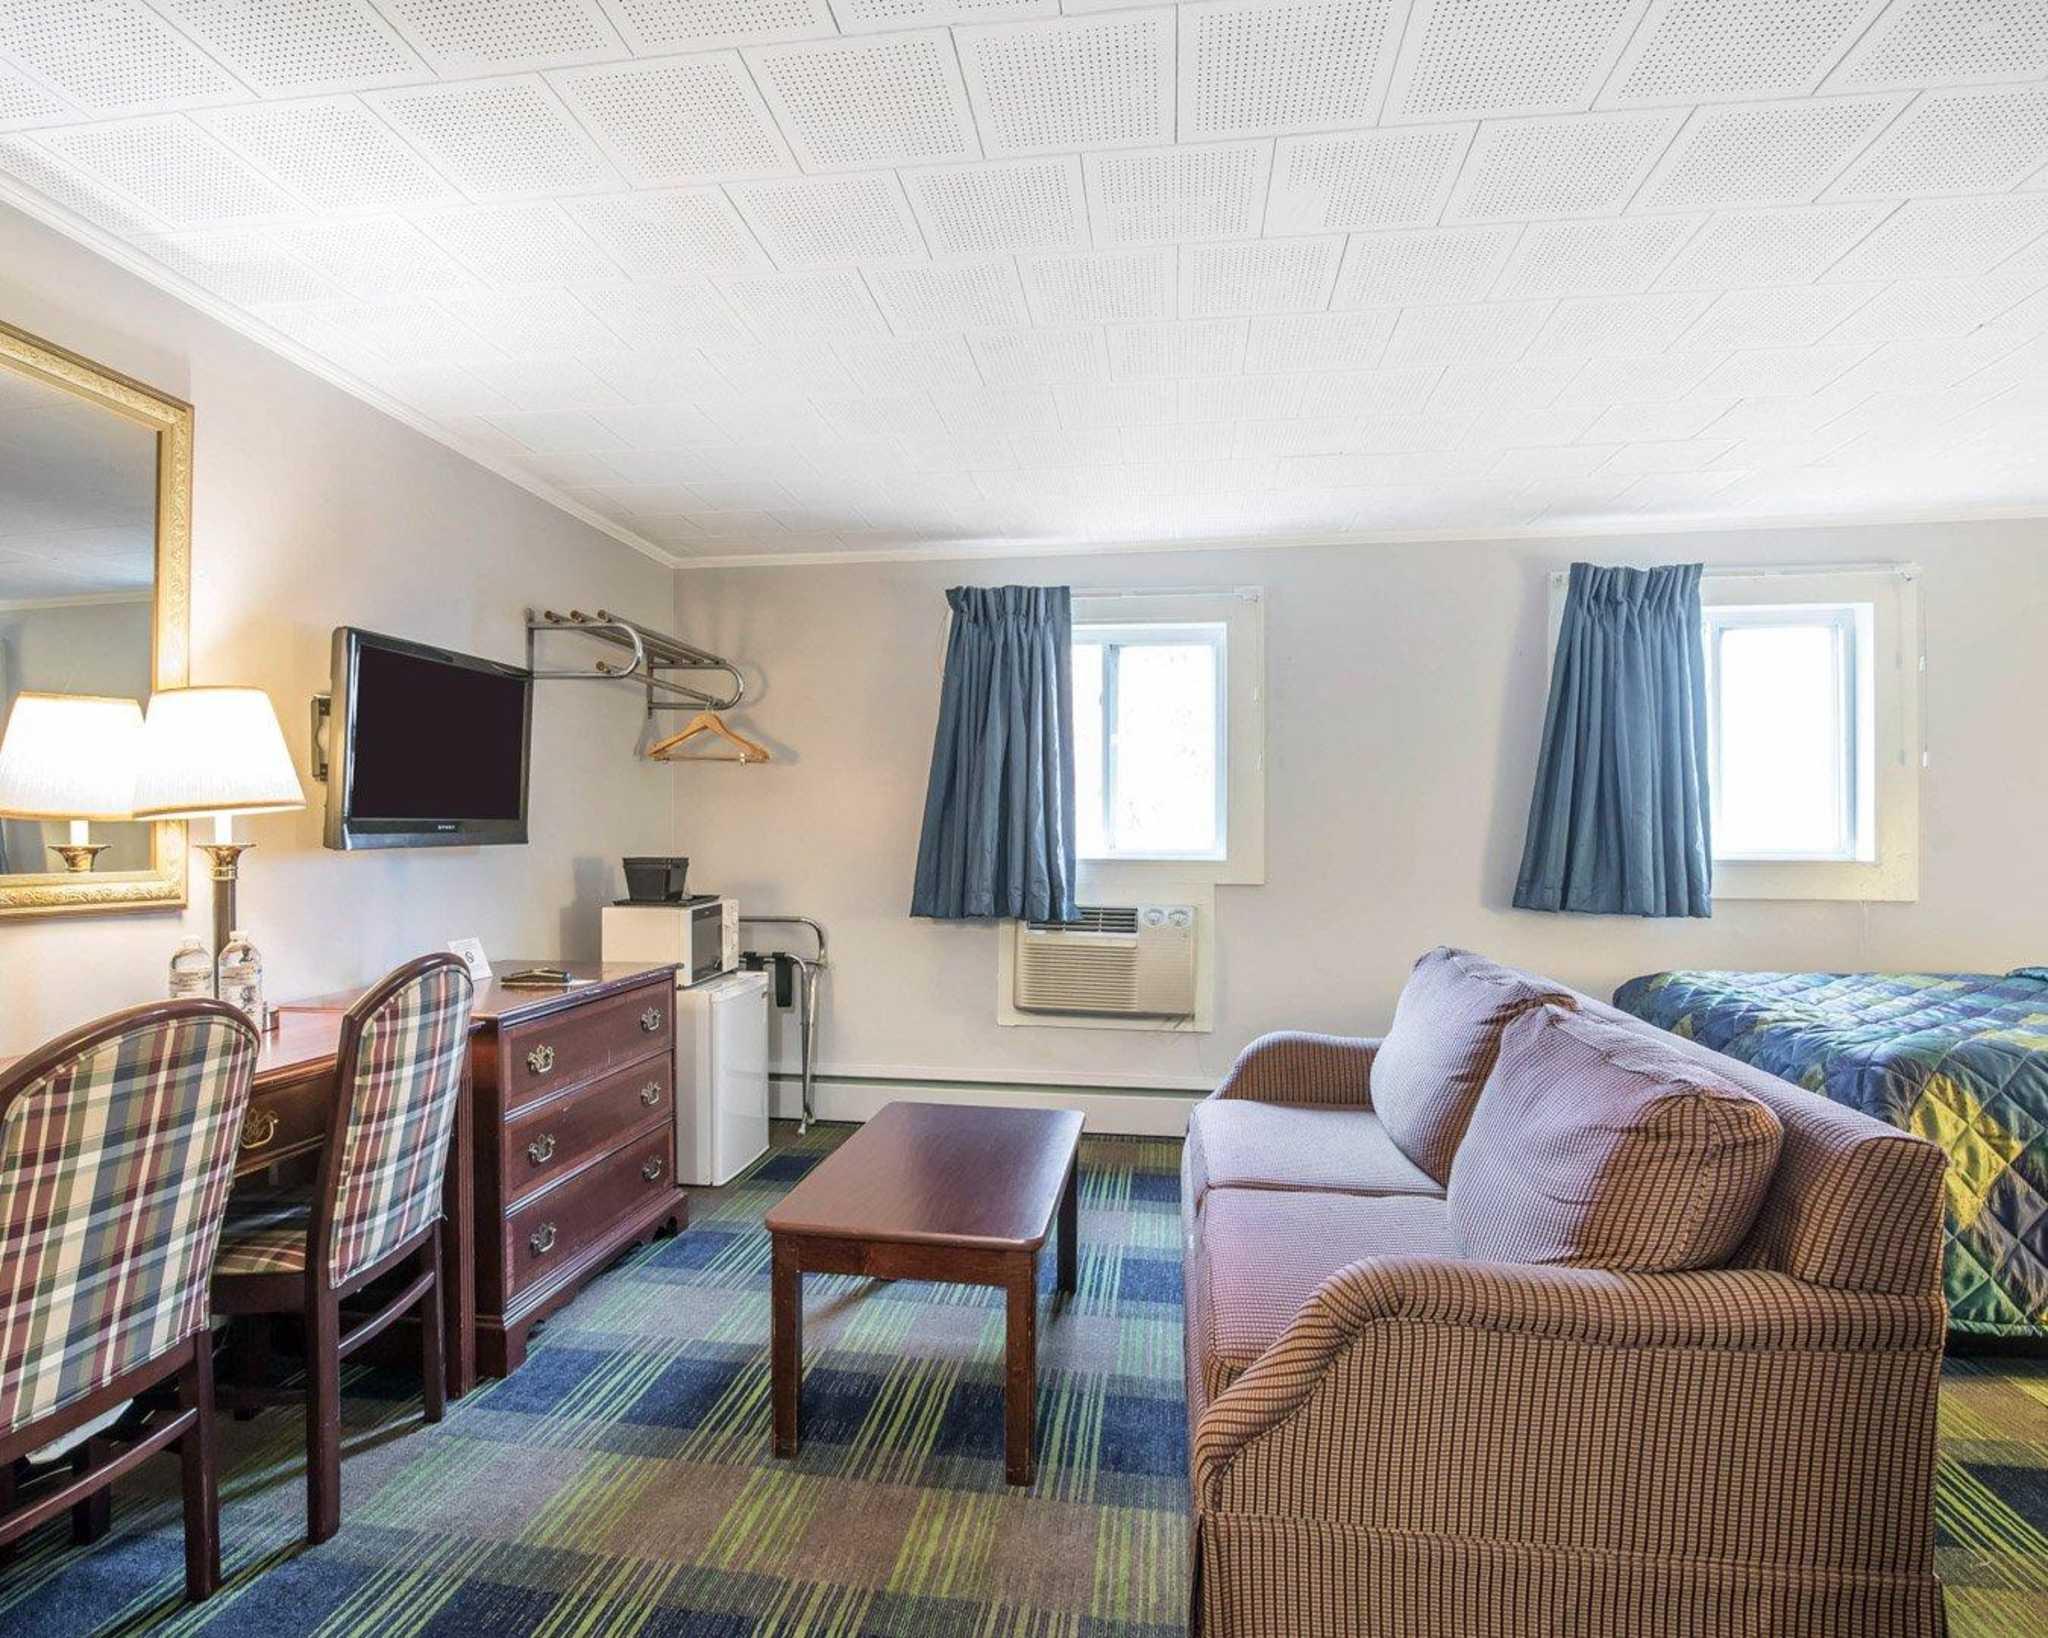 Rodeway Inn image 21